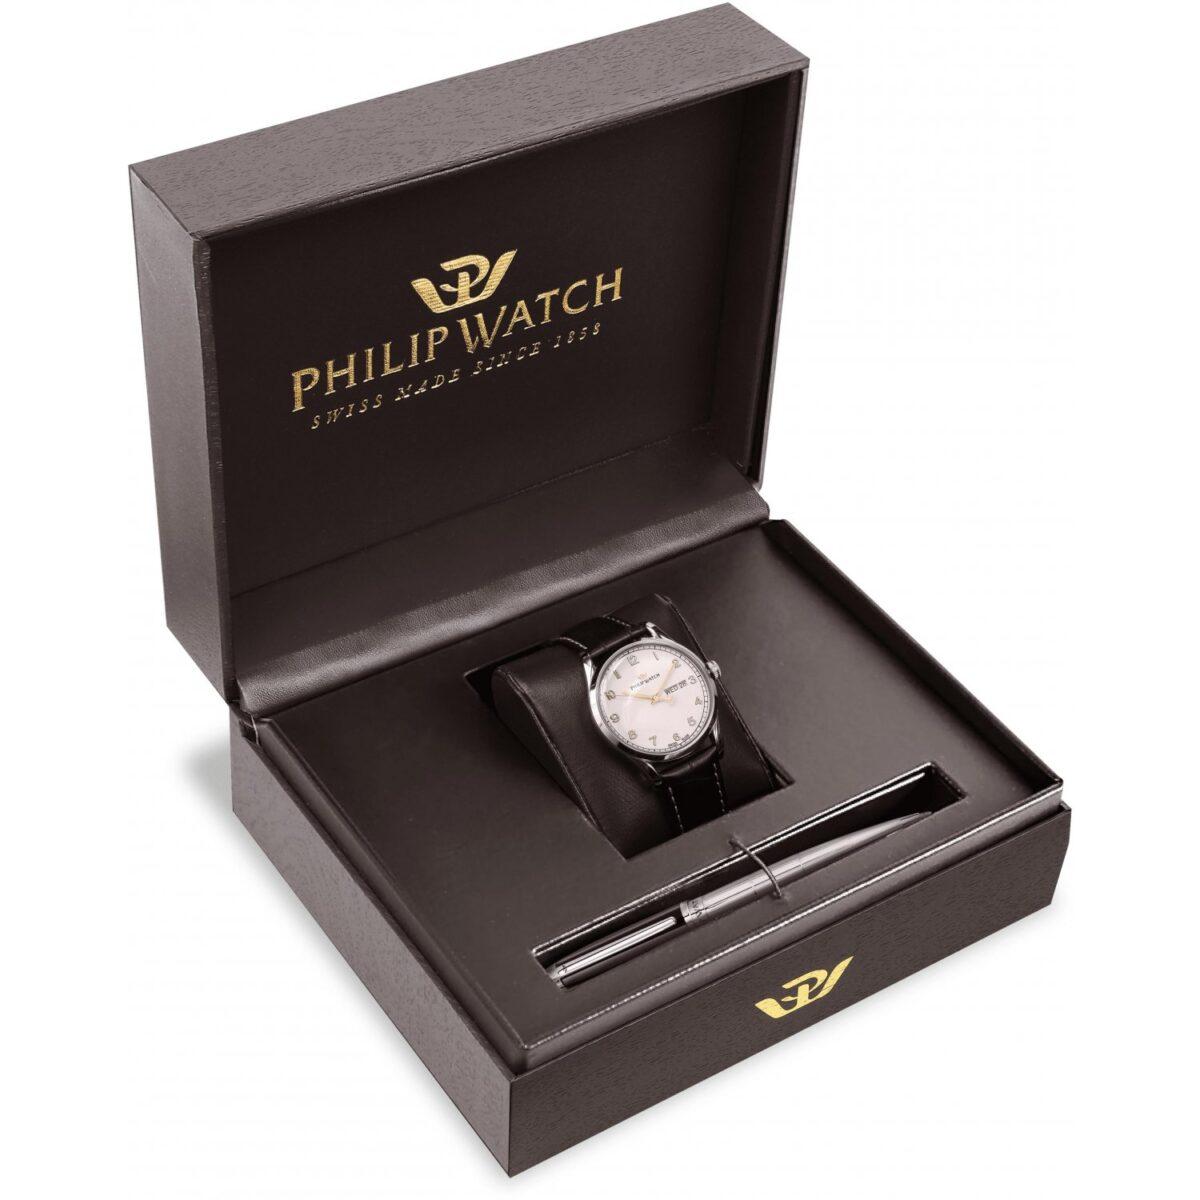 Orologio Uomo Philip Watch Sunray Day Date 39mm Pelle Nero Gift Box